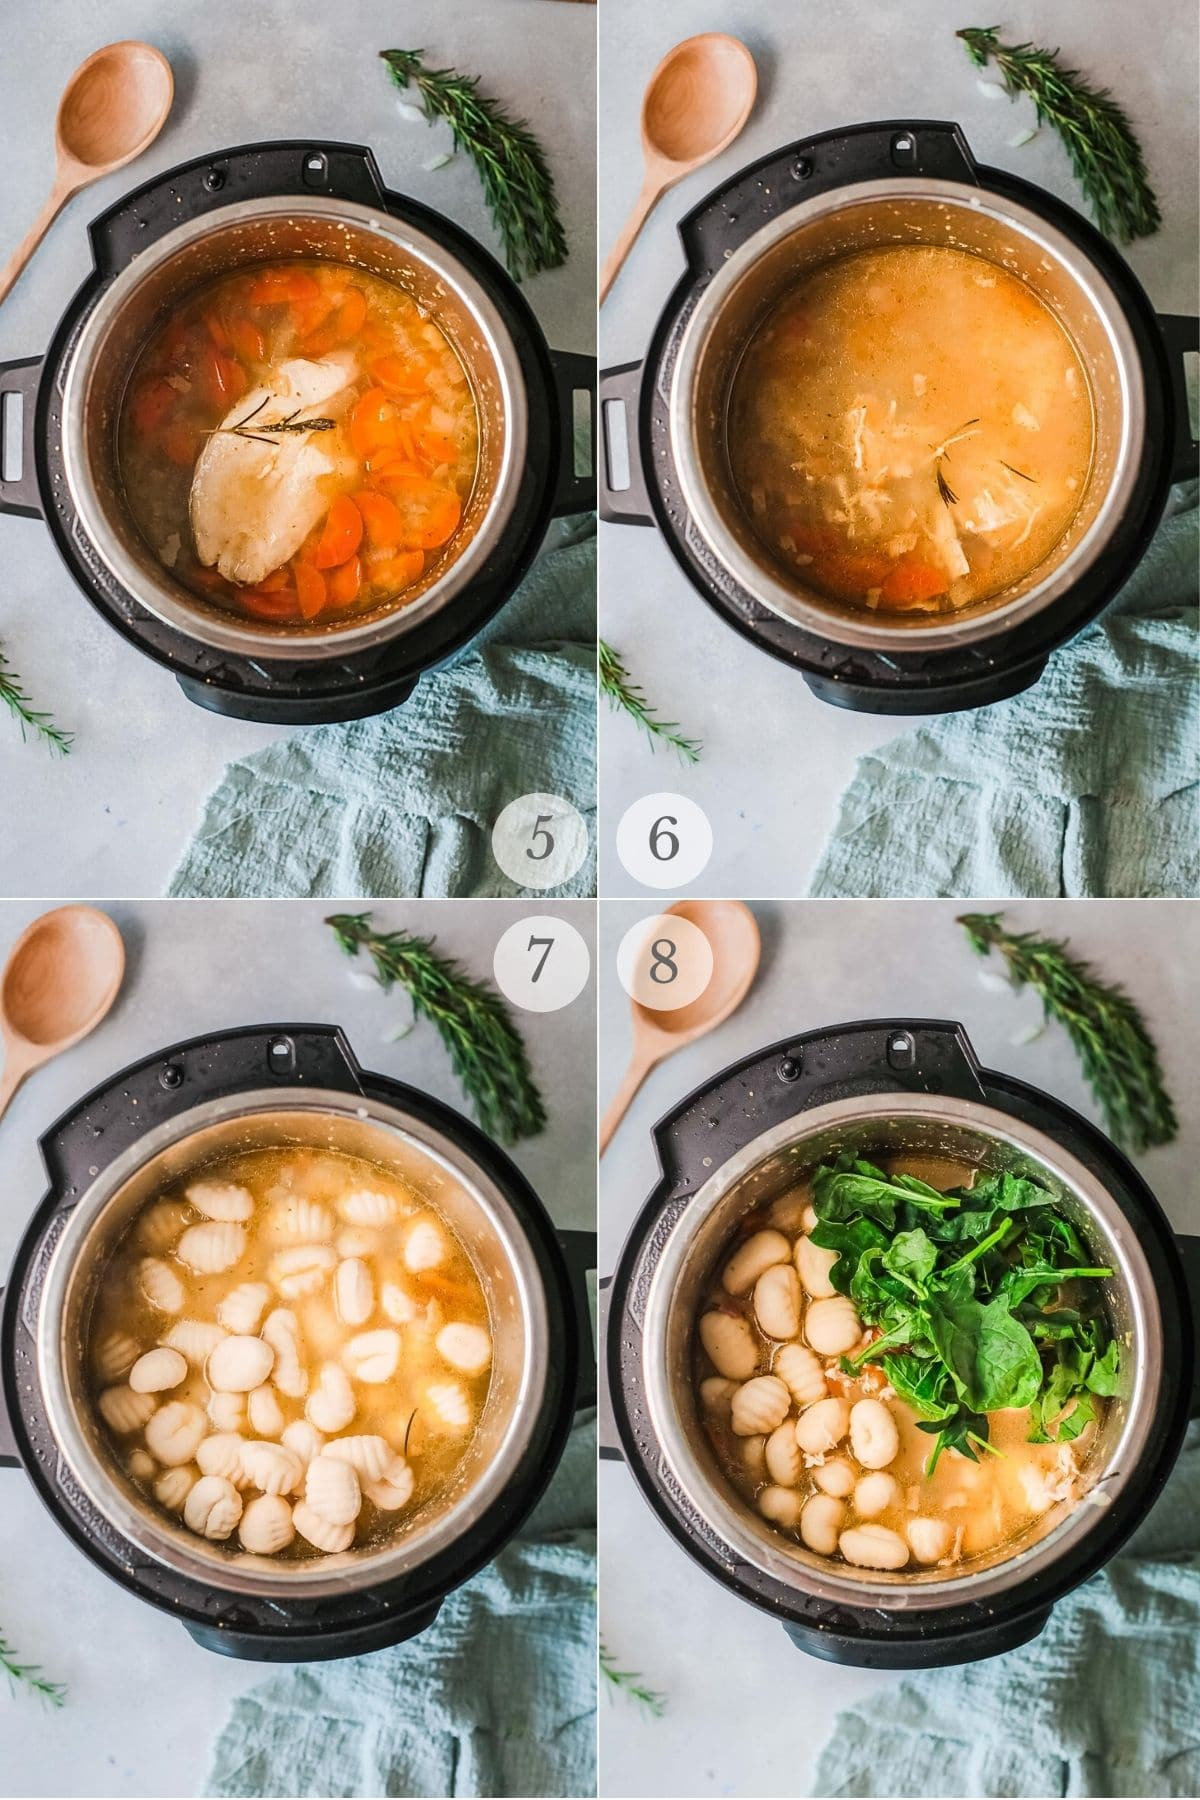 chicken gnocchi soup recipe steps 5-8